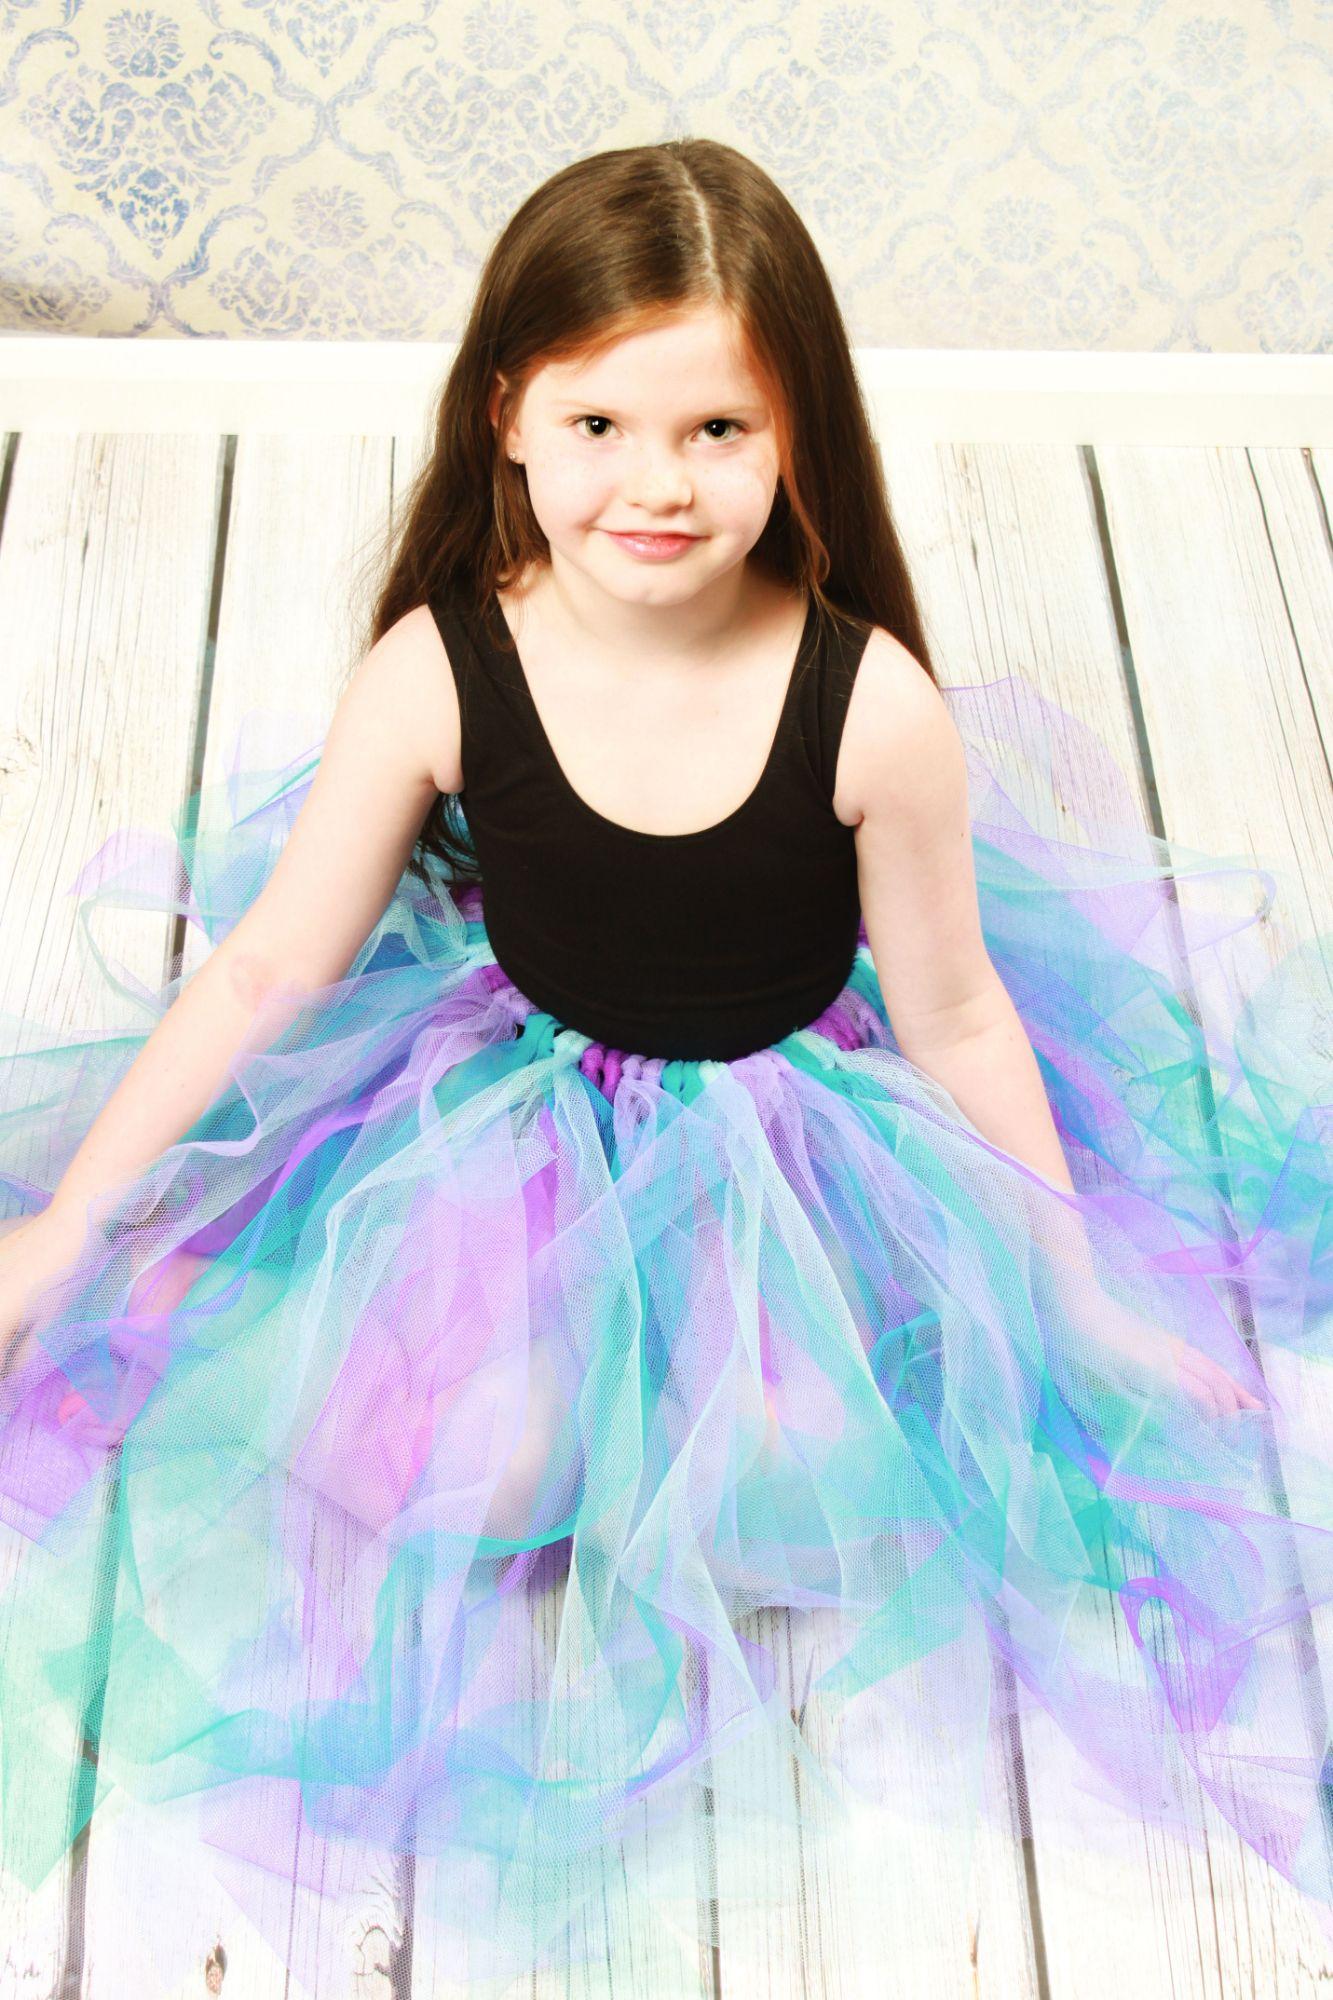 Fairy Tutu Skirts